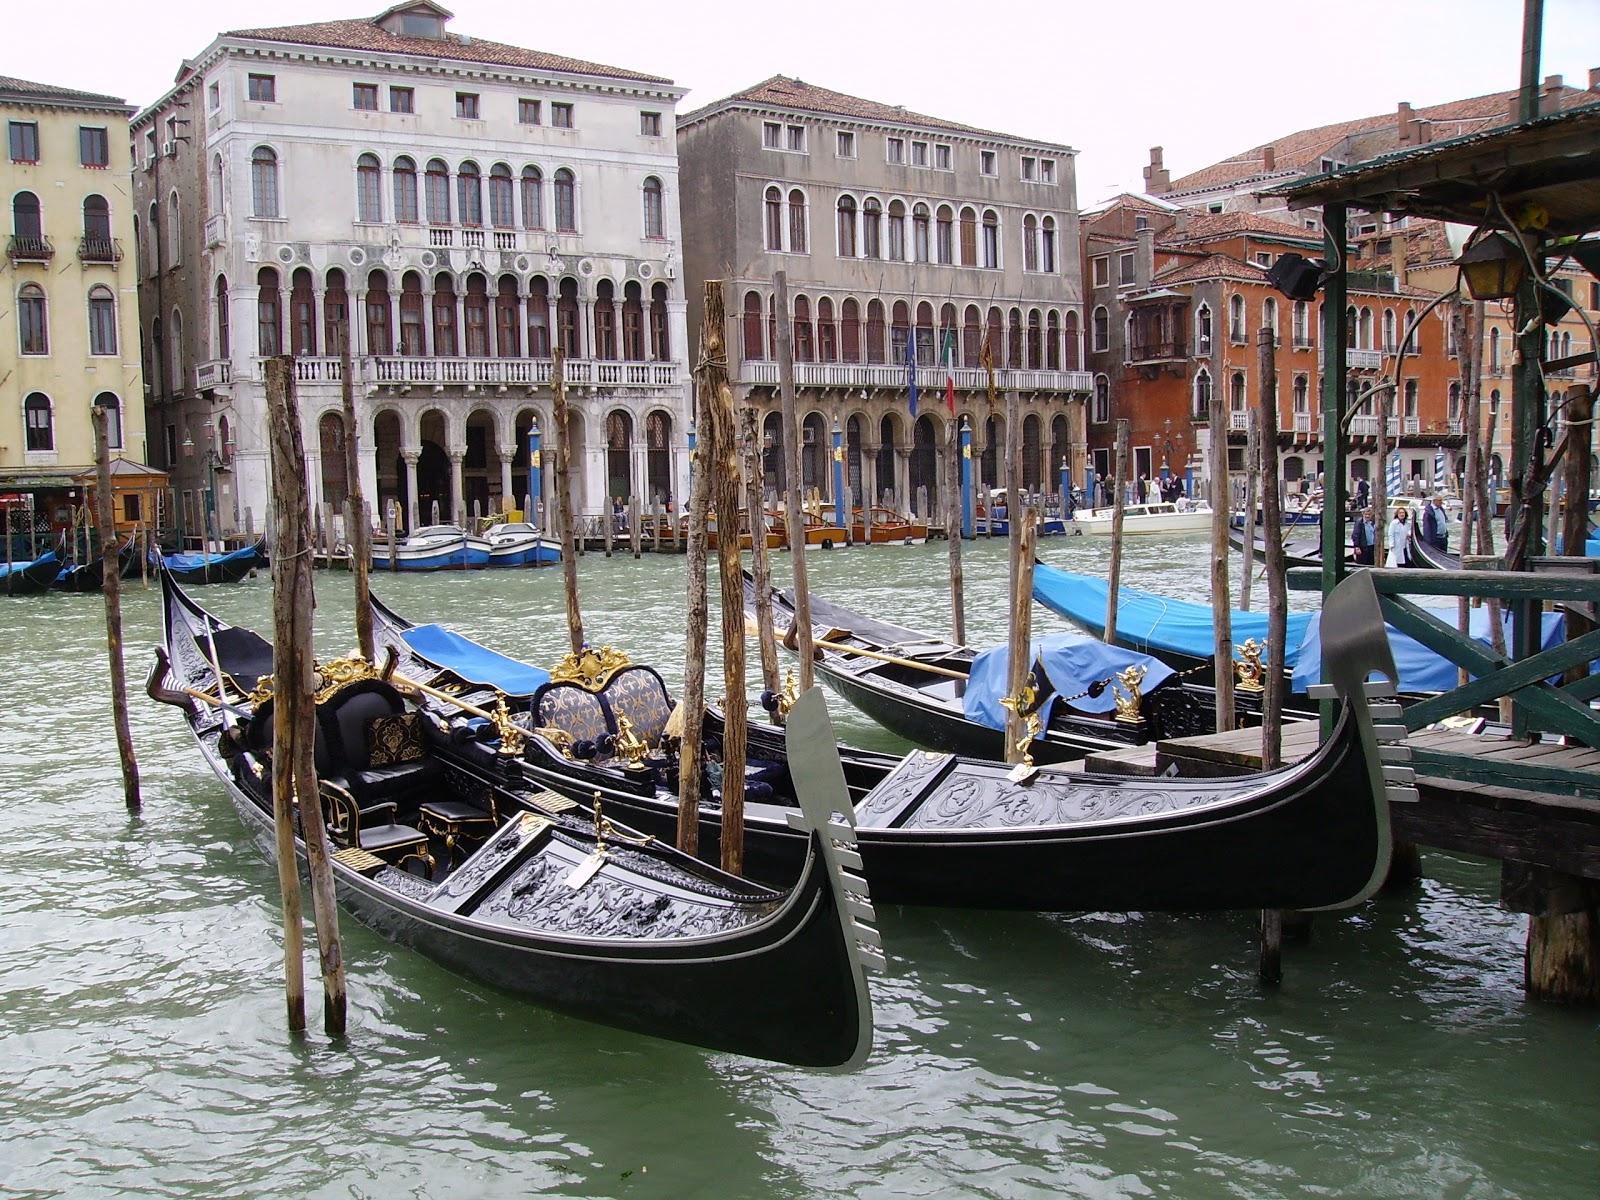 descriptive essay venice 122 writing venice: view paintings in grand tourist discourses on travel 49 13  canaletto  descriptive purposes in this document 11 giovanni antonio.